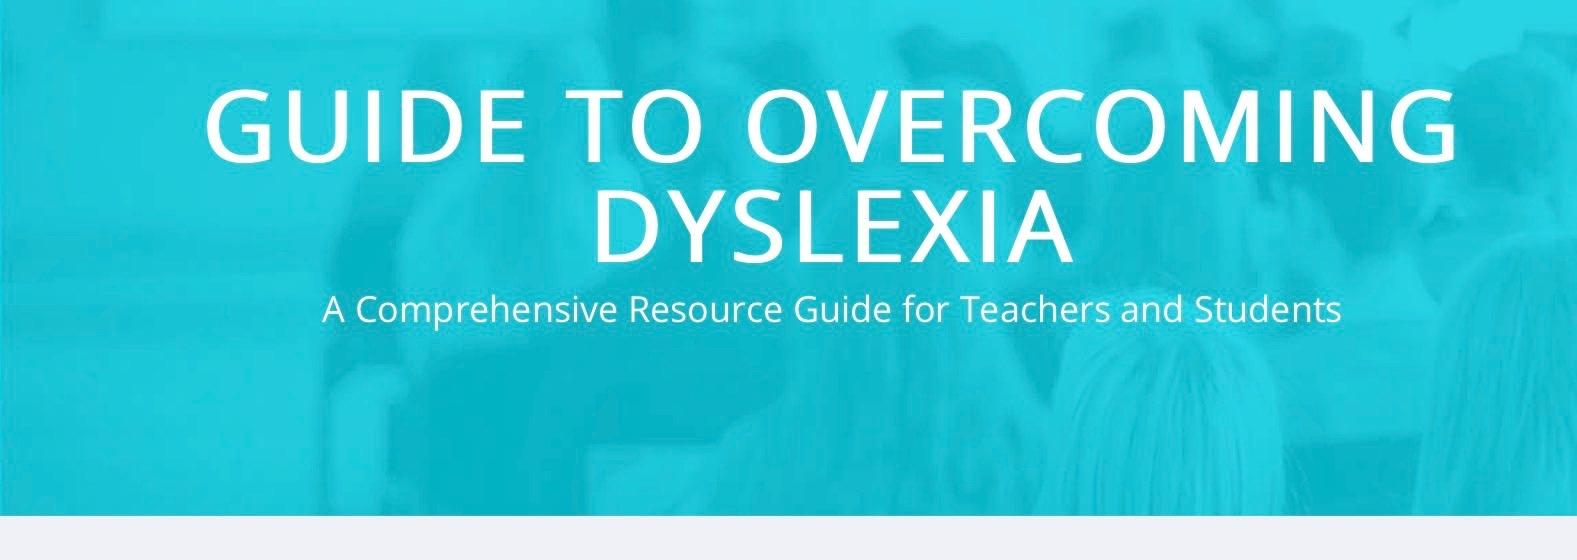 guide to overcoming dyslexia.jpeg